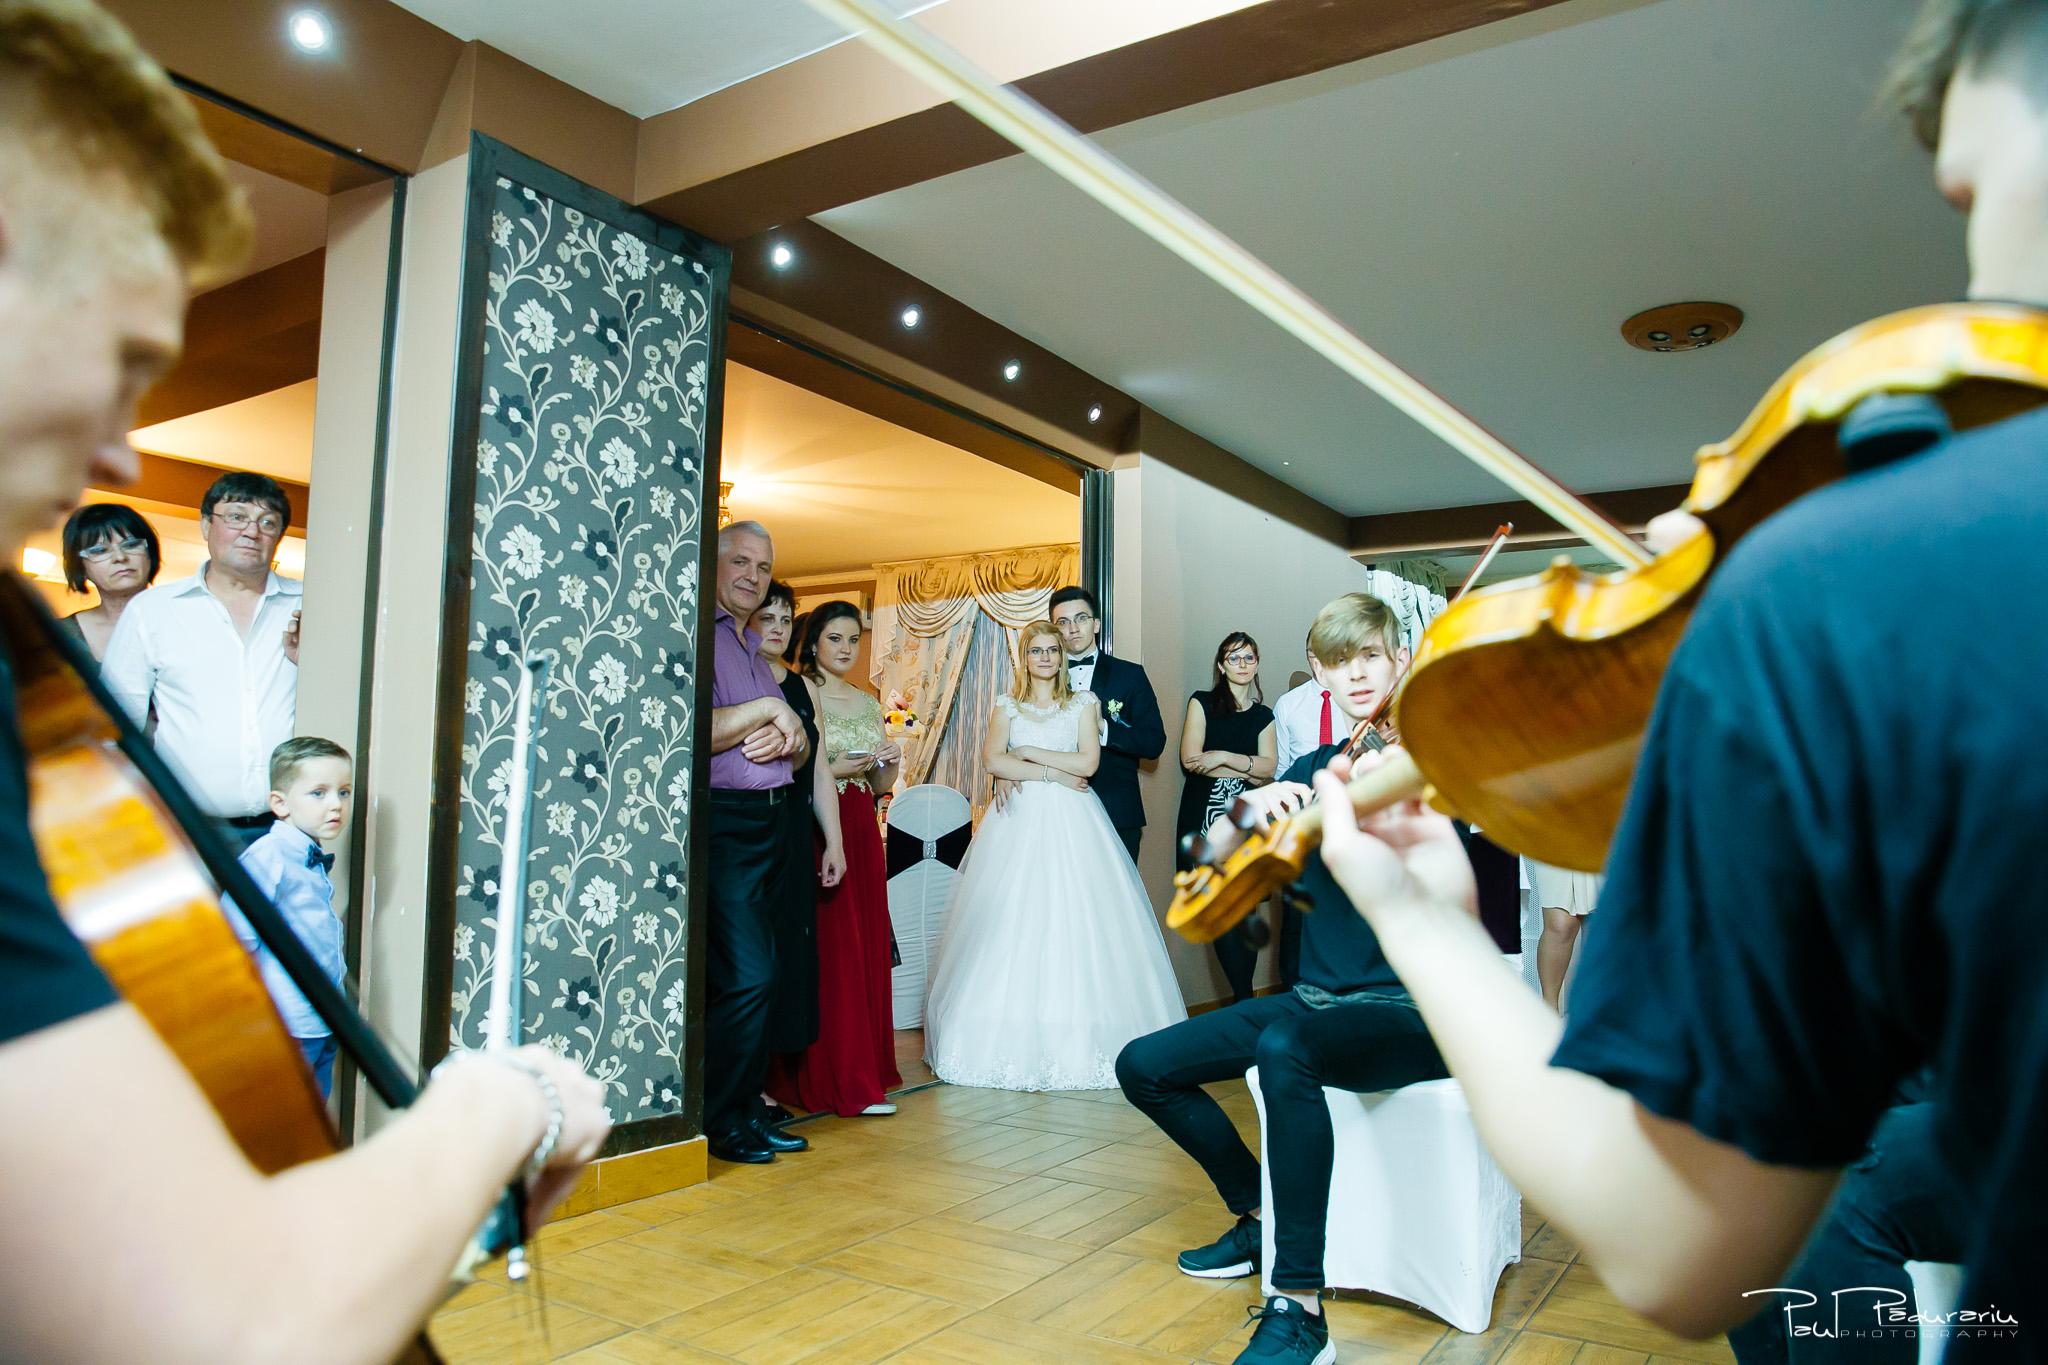 Anca si Razvan petrecere restaurant American Iasi - Paul Padurariu fotograf profesionist nunta iasi www.paulpadurariu.ro © 2018 Paul Padurariu moment artistic 2